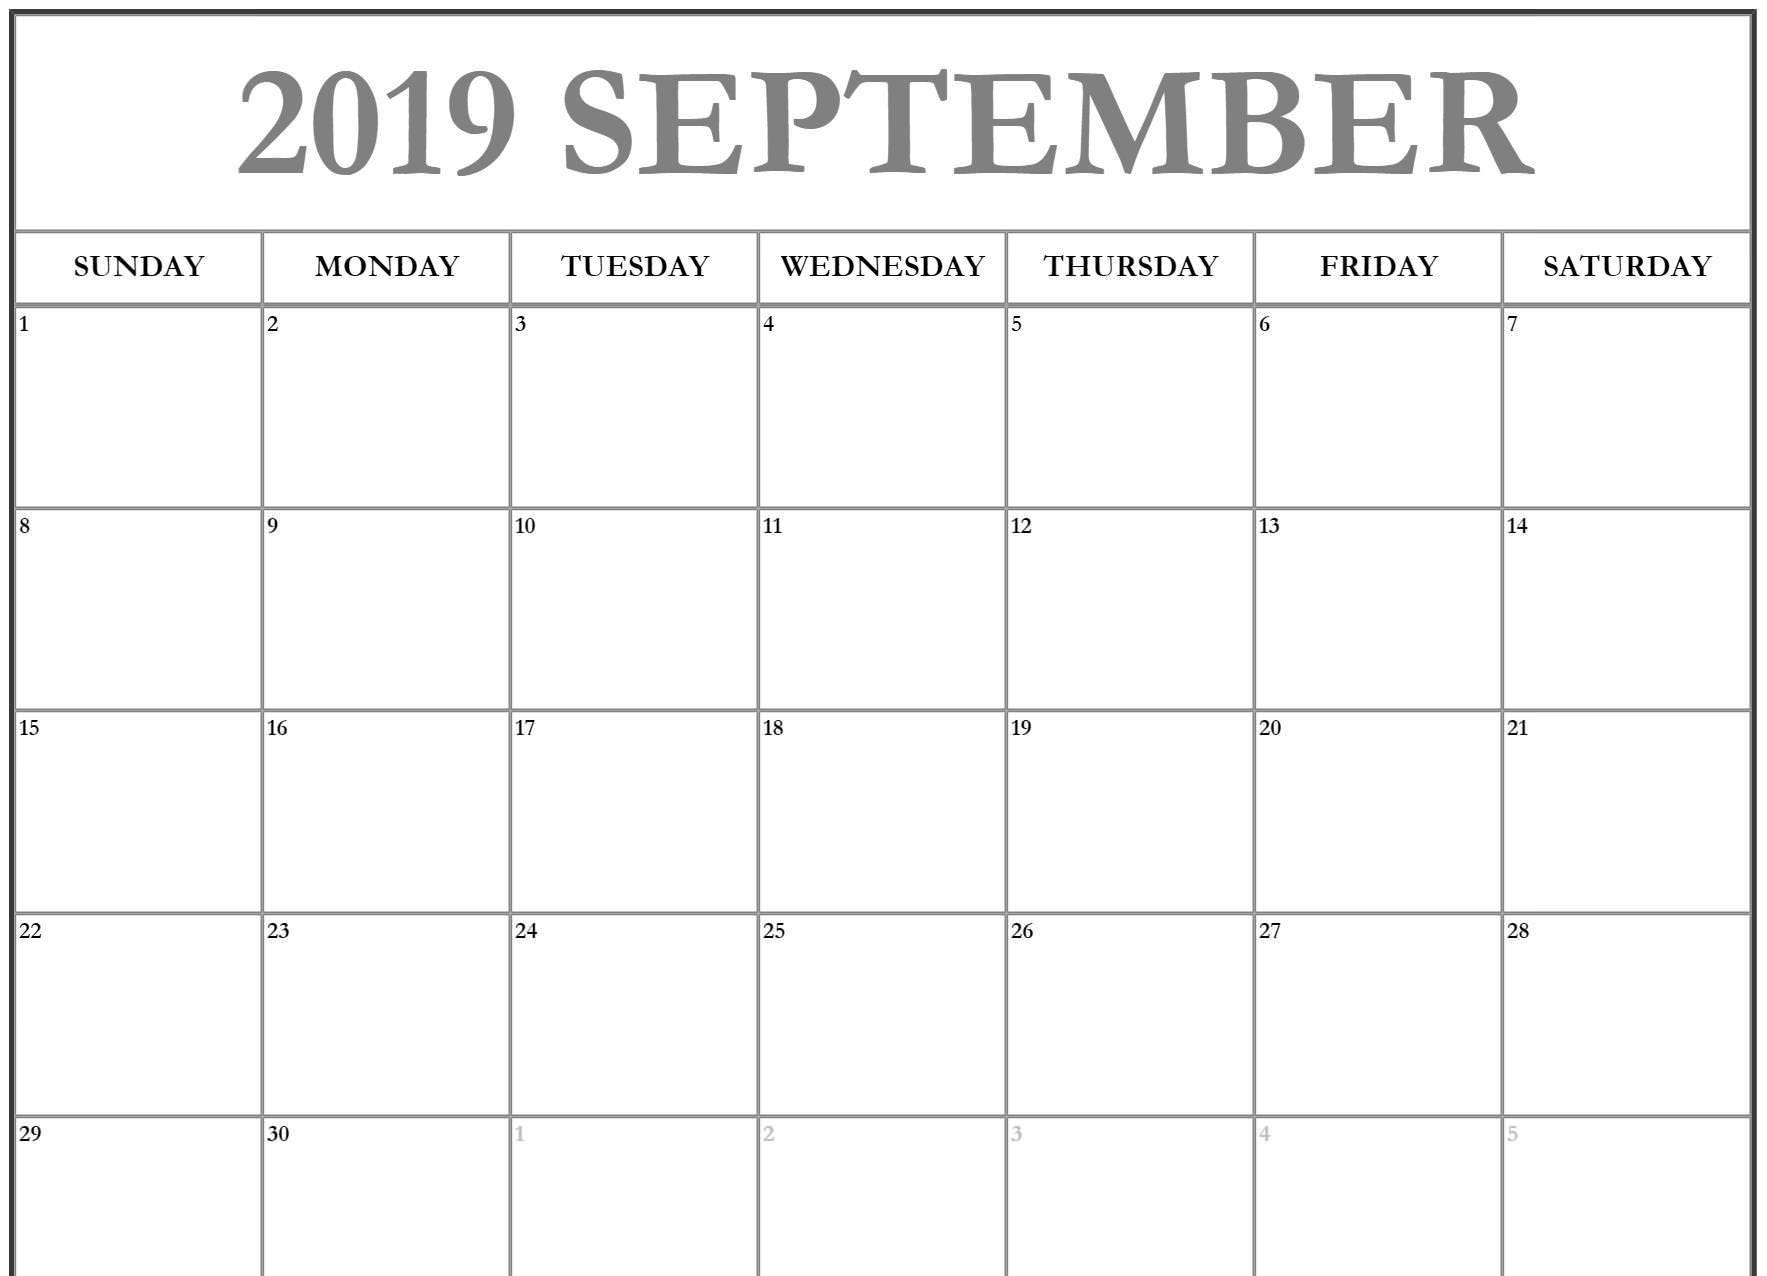 September calendar 2019 printable